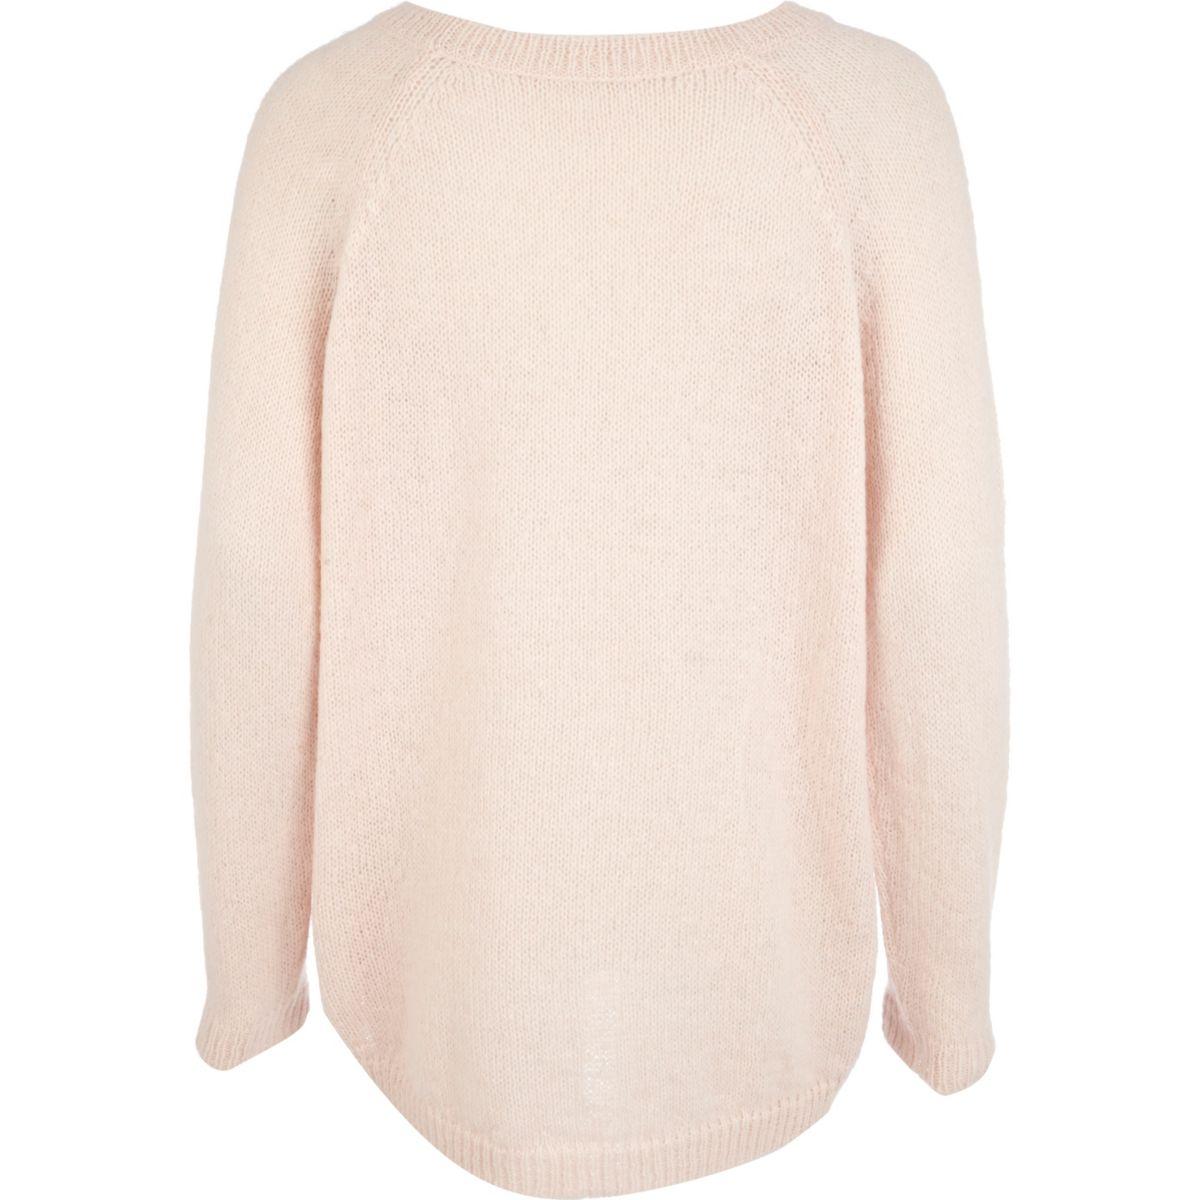 Pink kiss me Christmas sweater - Knitwear - Sale - women